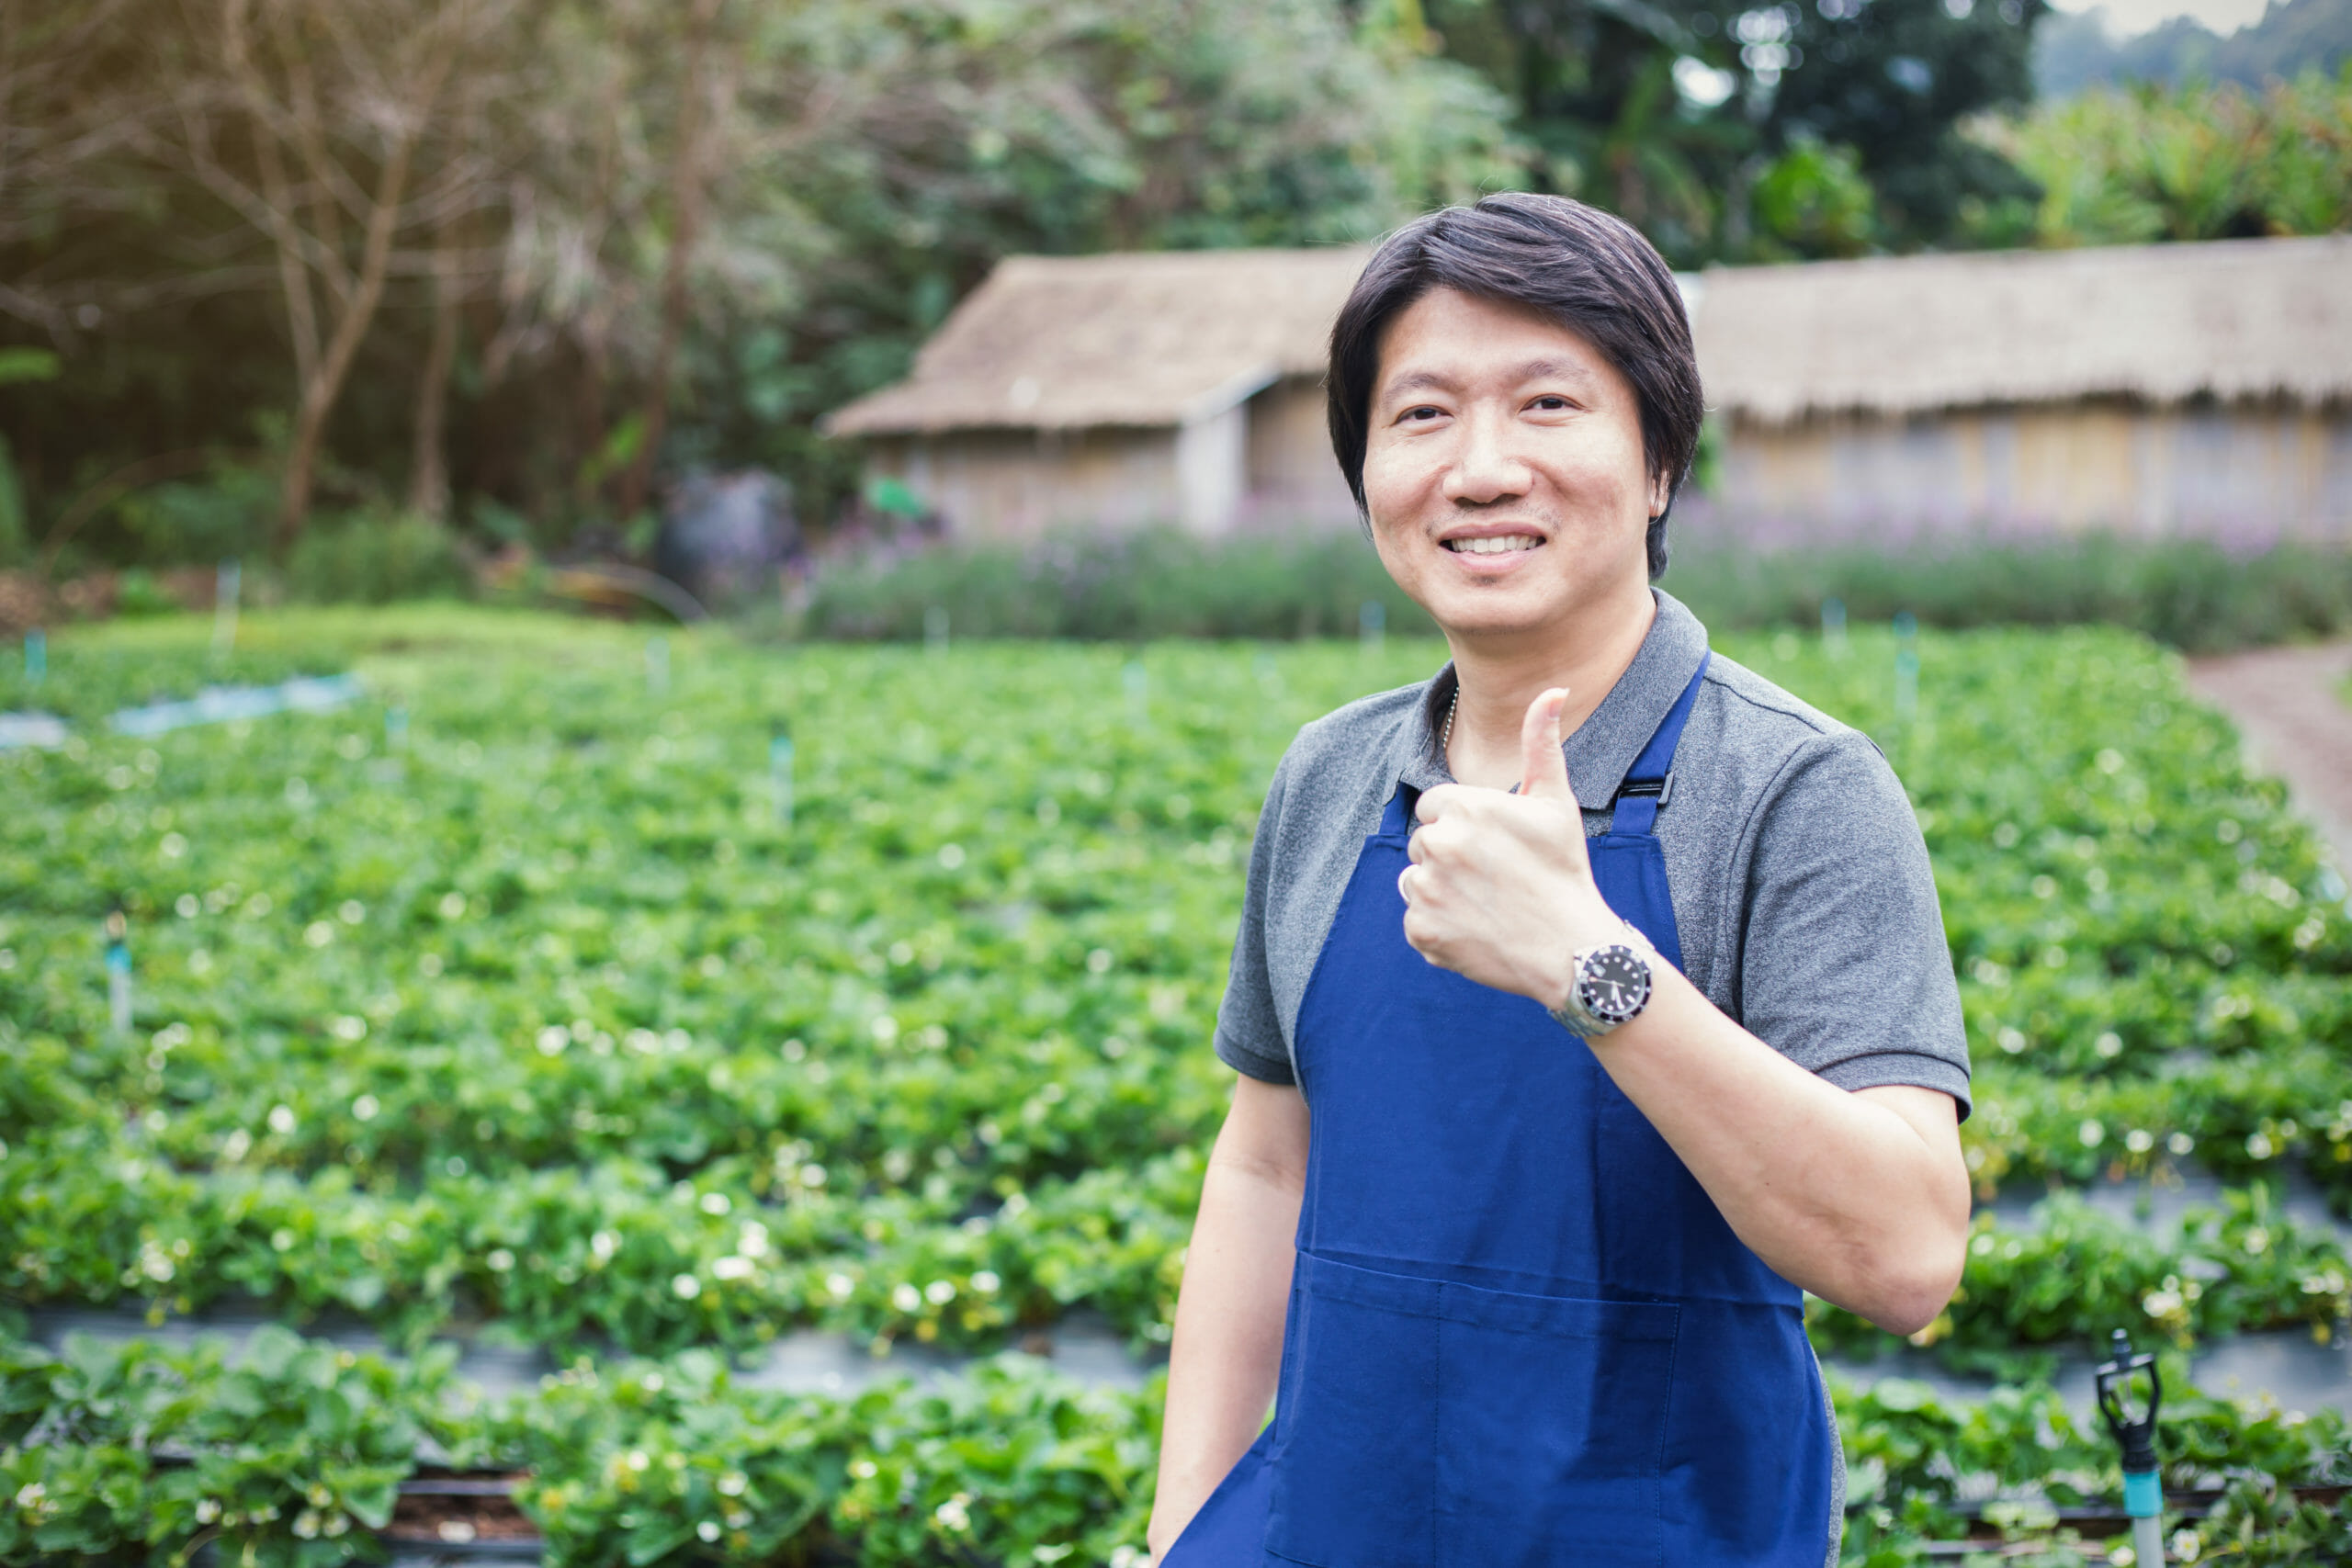 happy-owner-asian-man-working-gardening-789781606